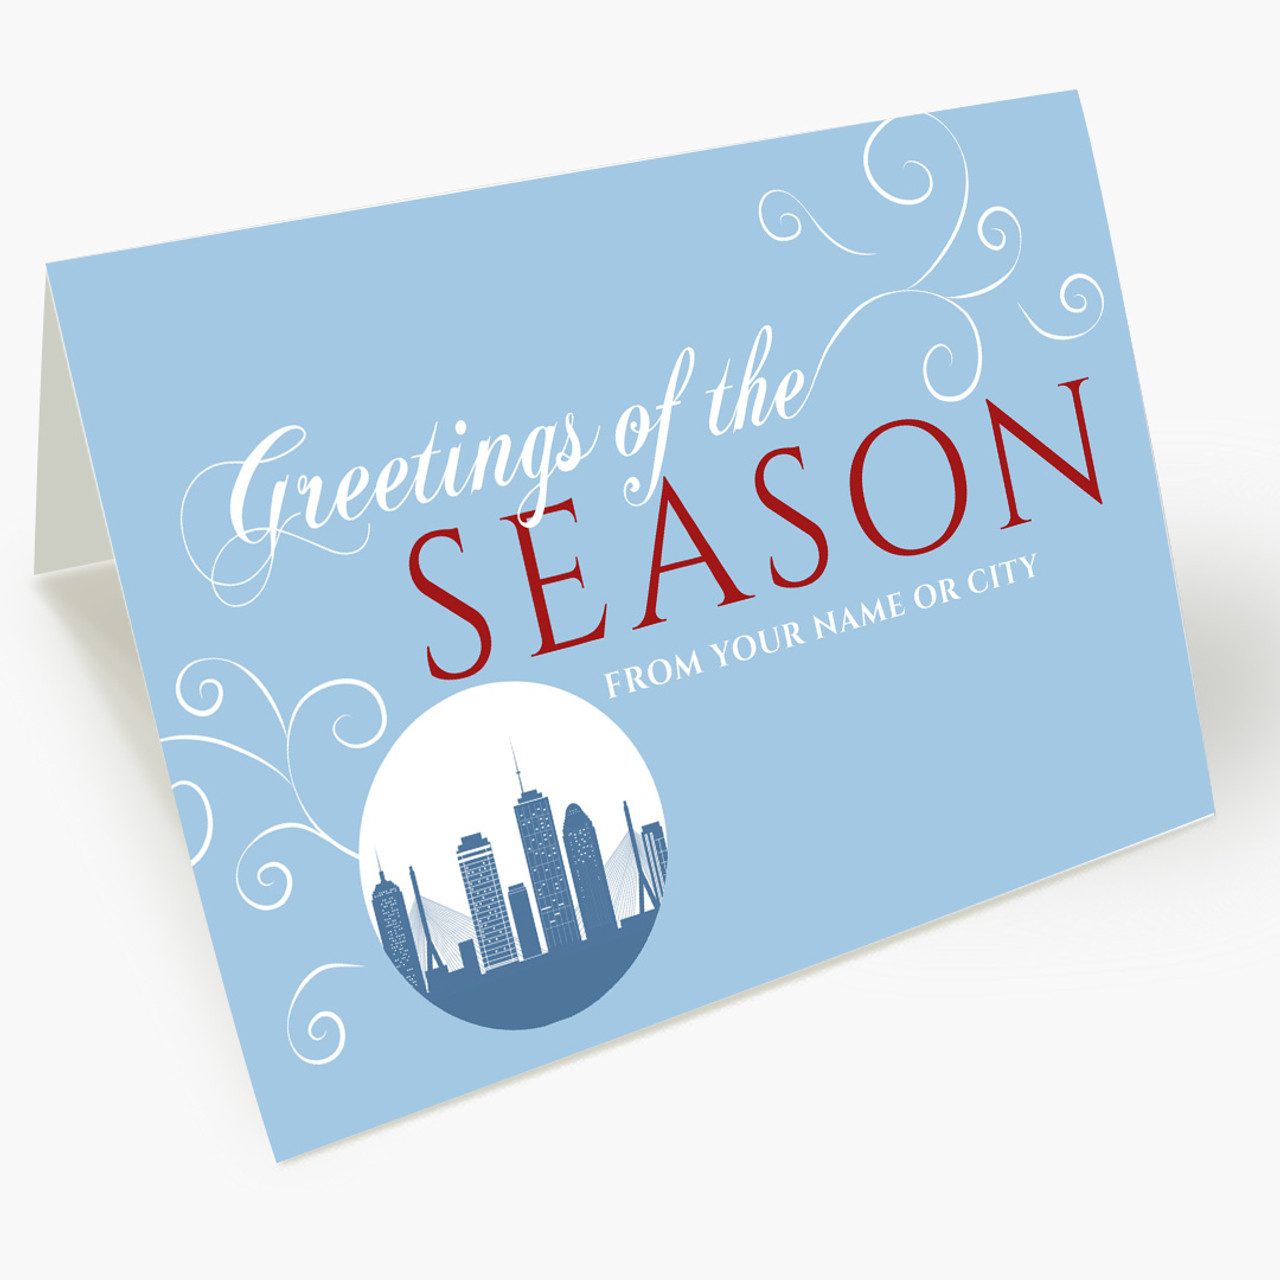 A Boston Greeting Christmas Card